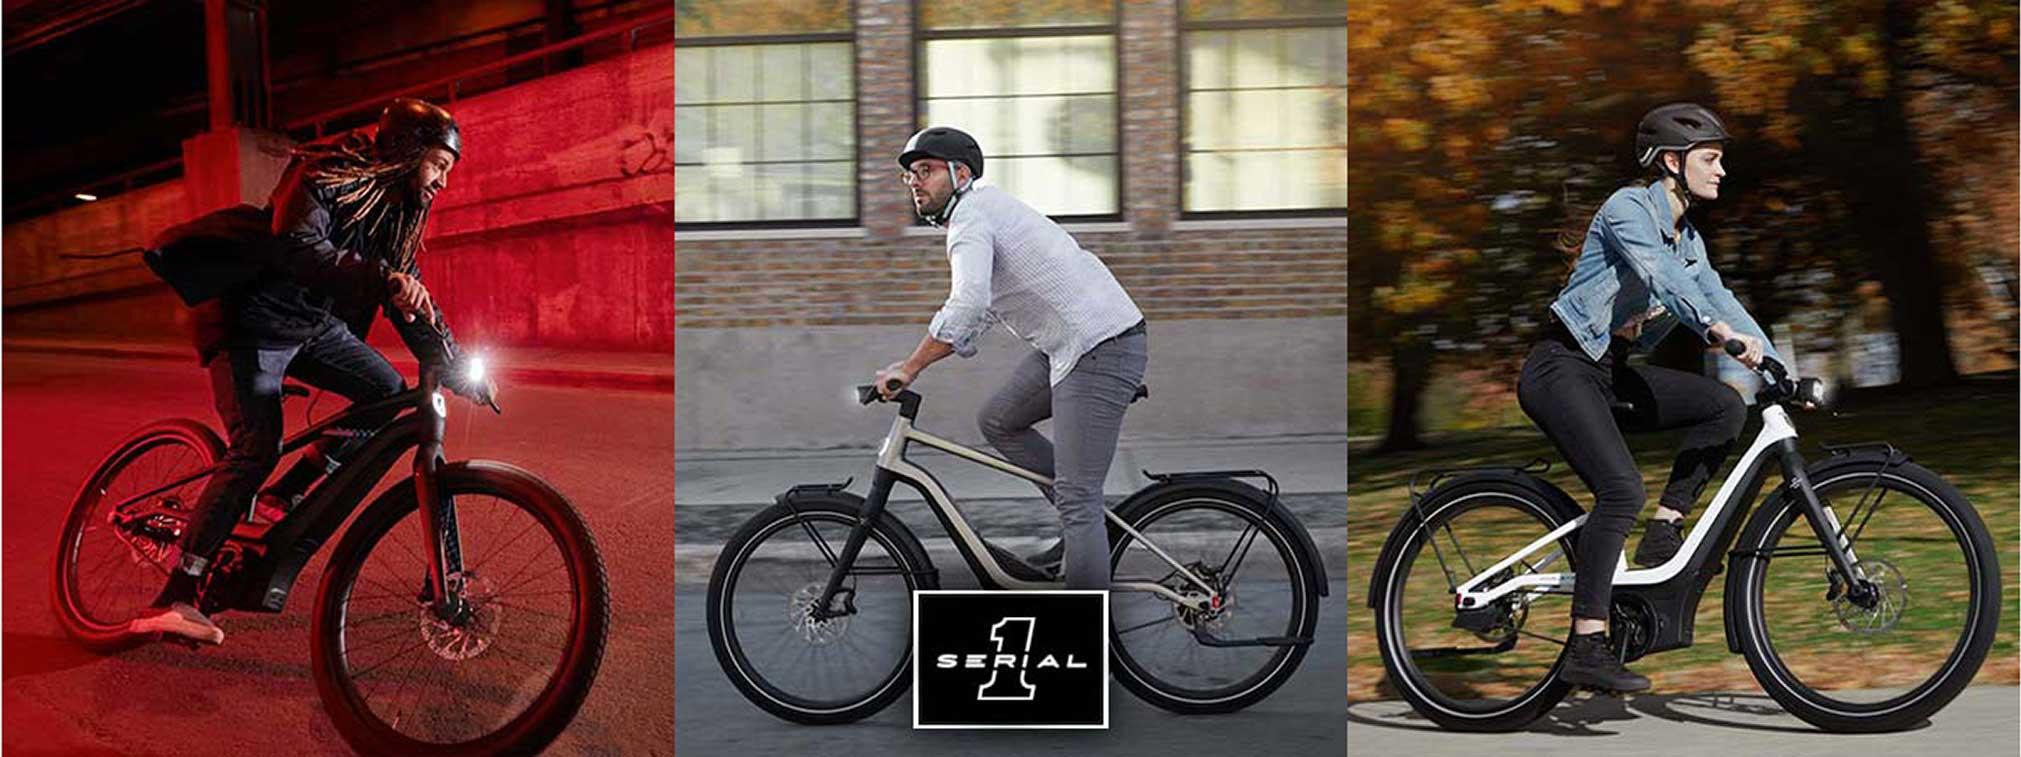 f2 serial1 harleydavidson ebikes banner